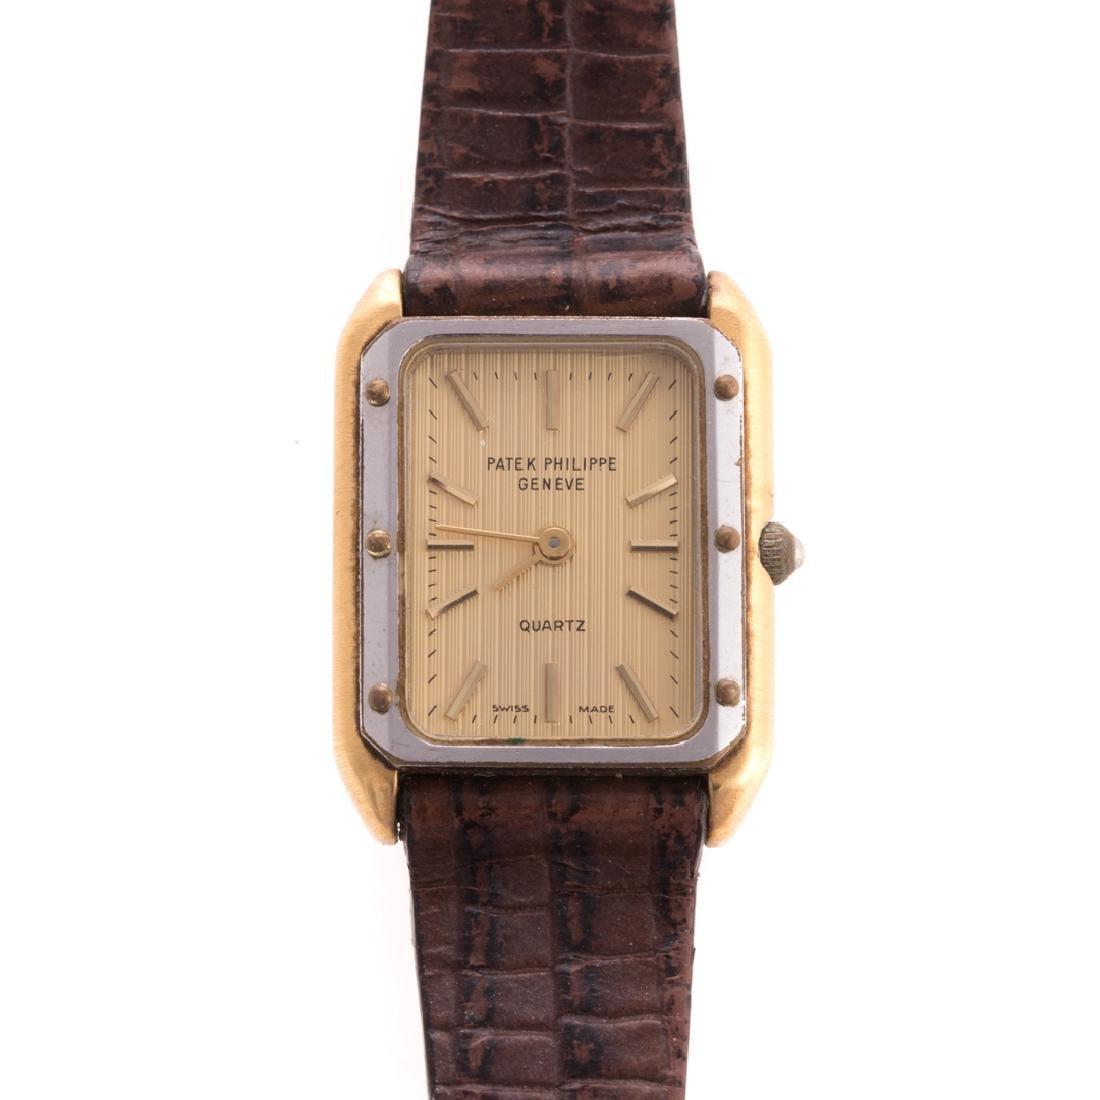 A Lady's Classic Patek Philippe Wrist Watch